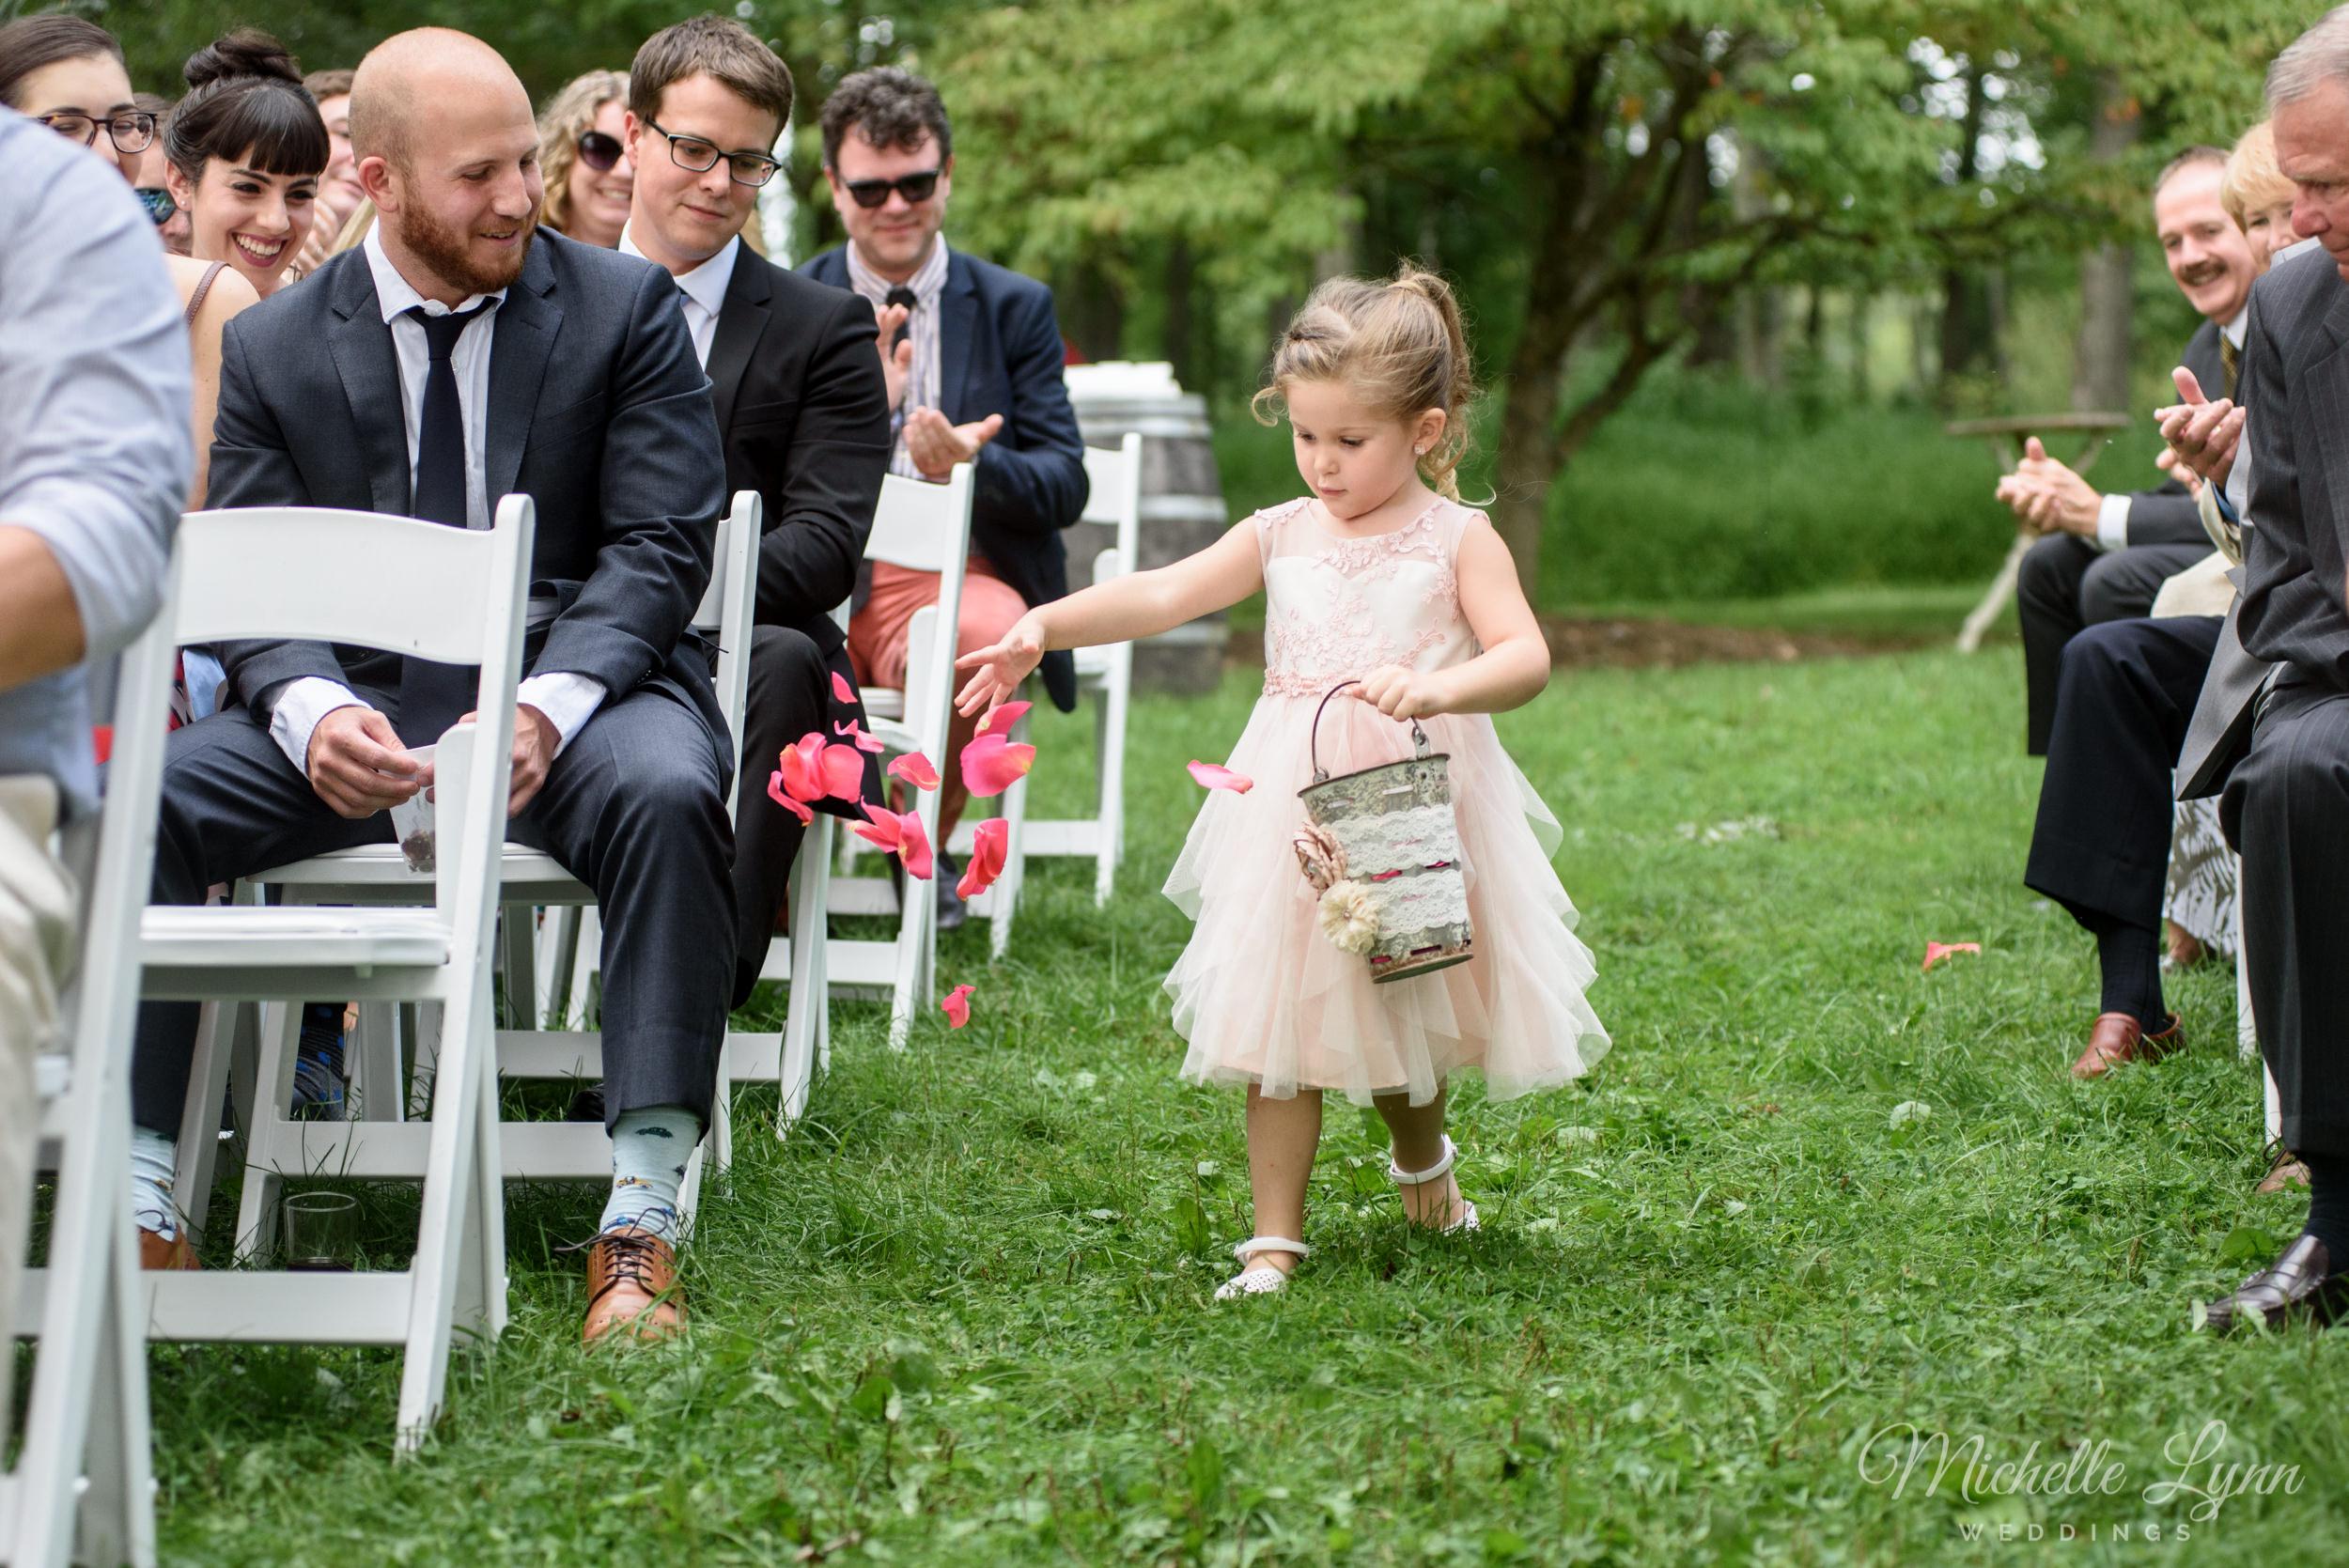 mlw-unionville-vineyards-nj-wedding-photography-32.jpg